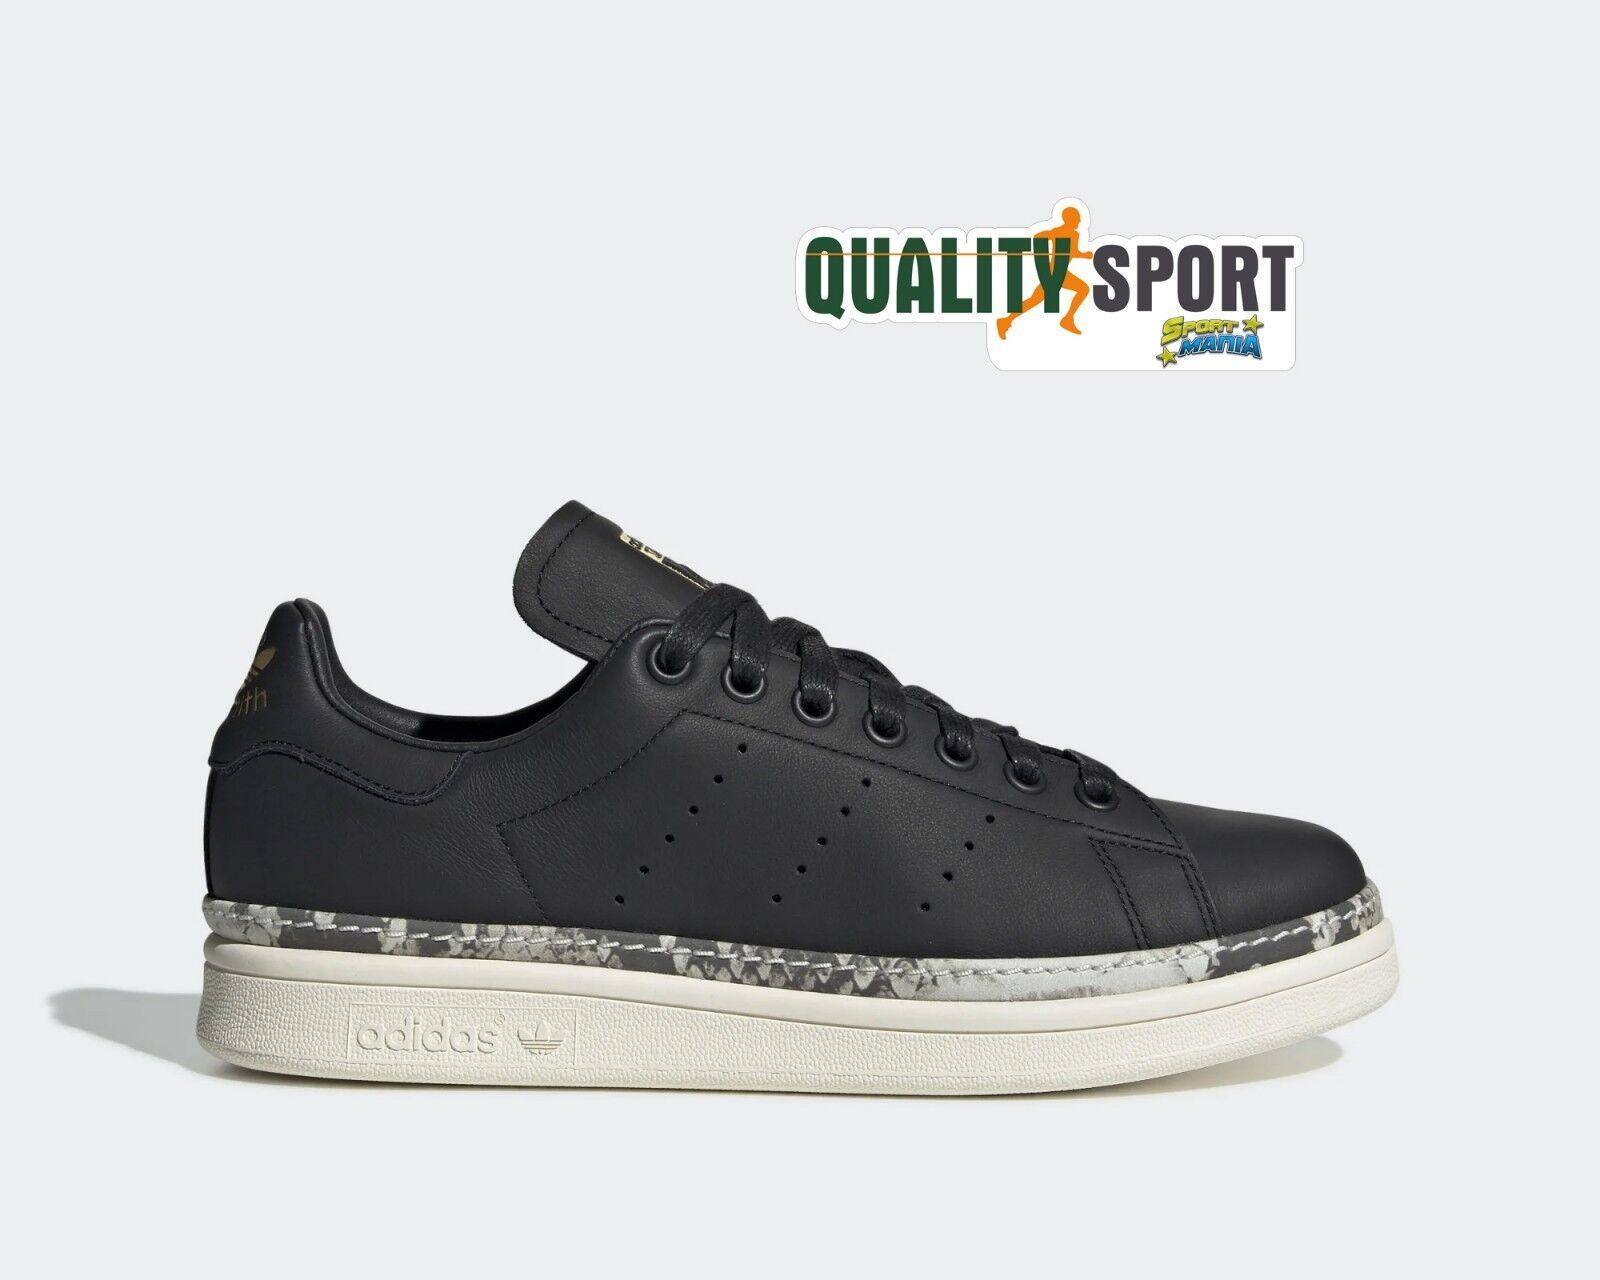 Adidas Stan Smith New Bold black shoes women Sportive Sneakers BD8053 2019